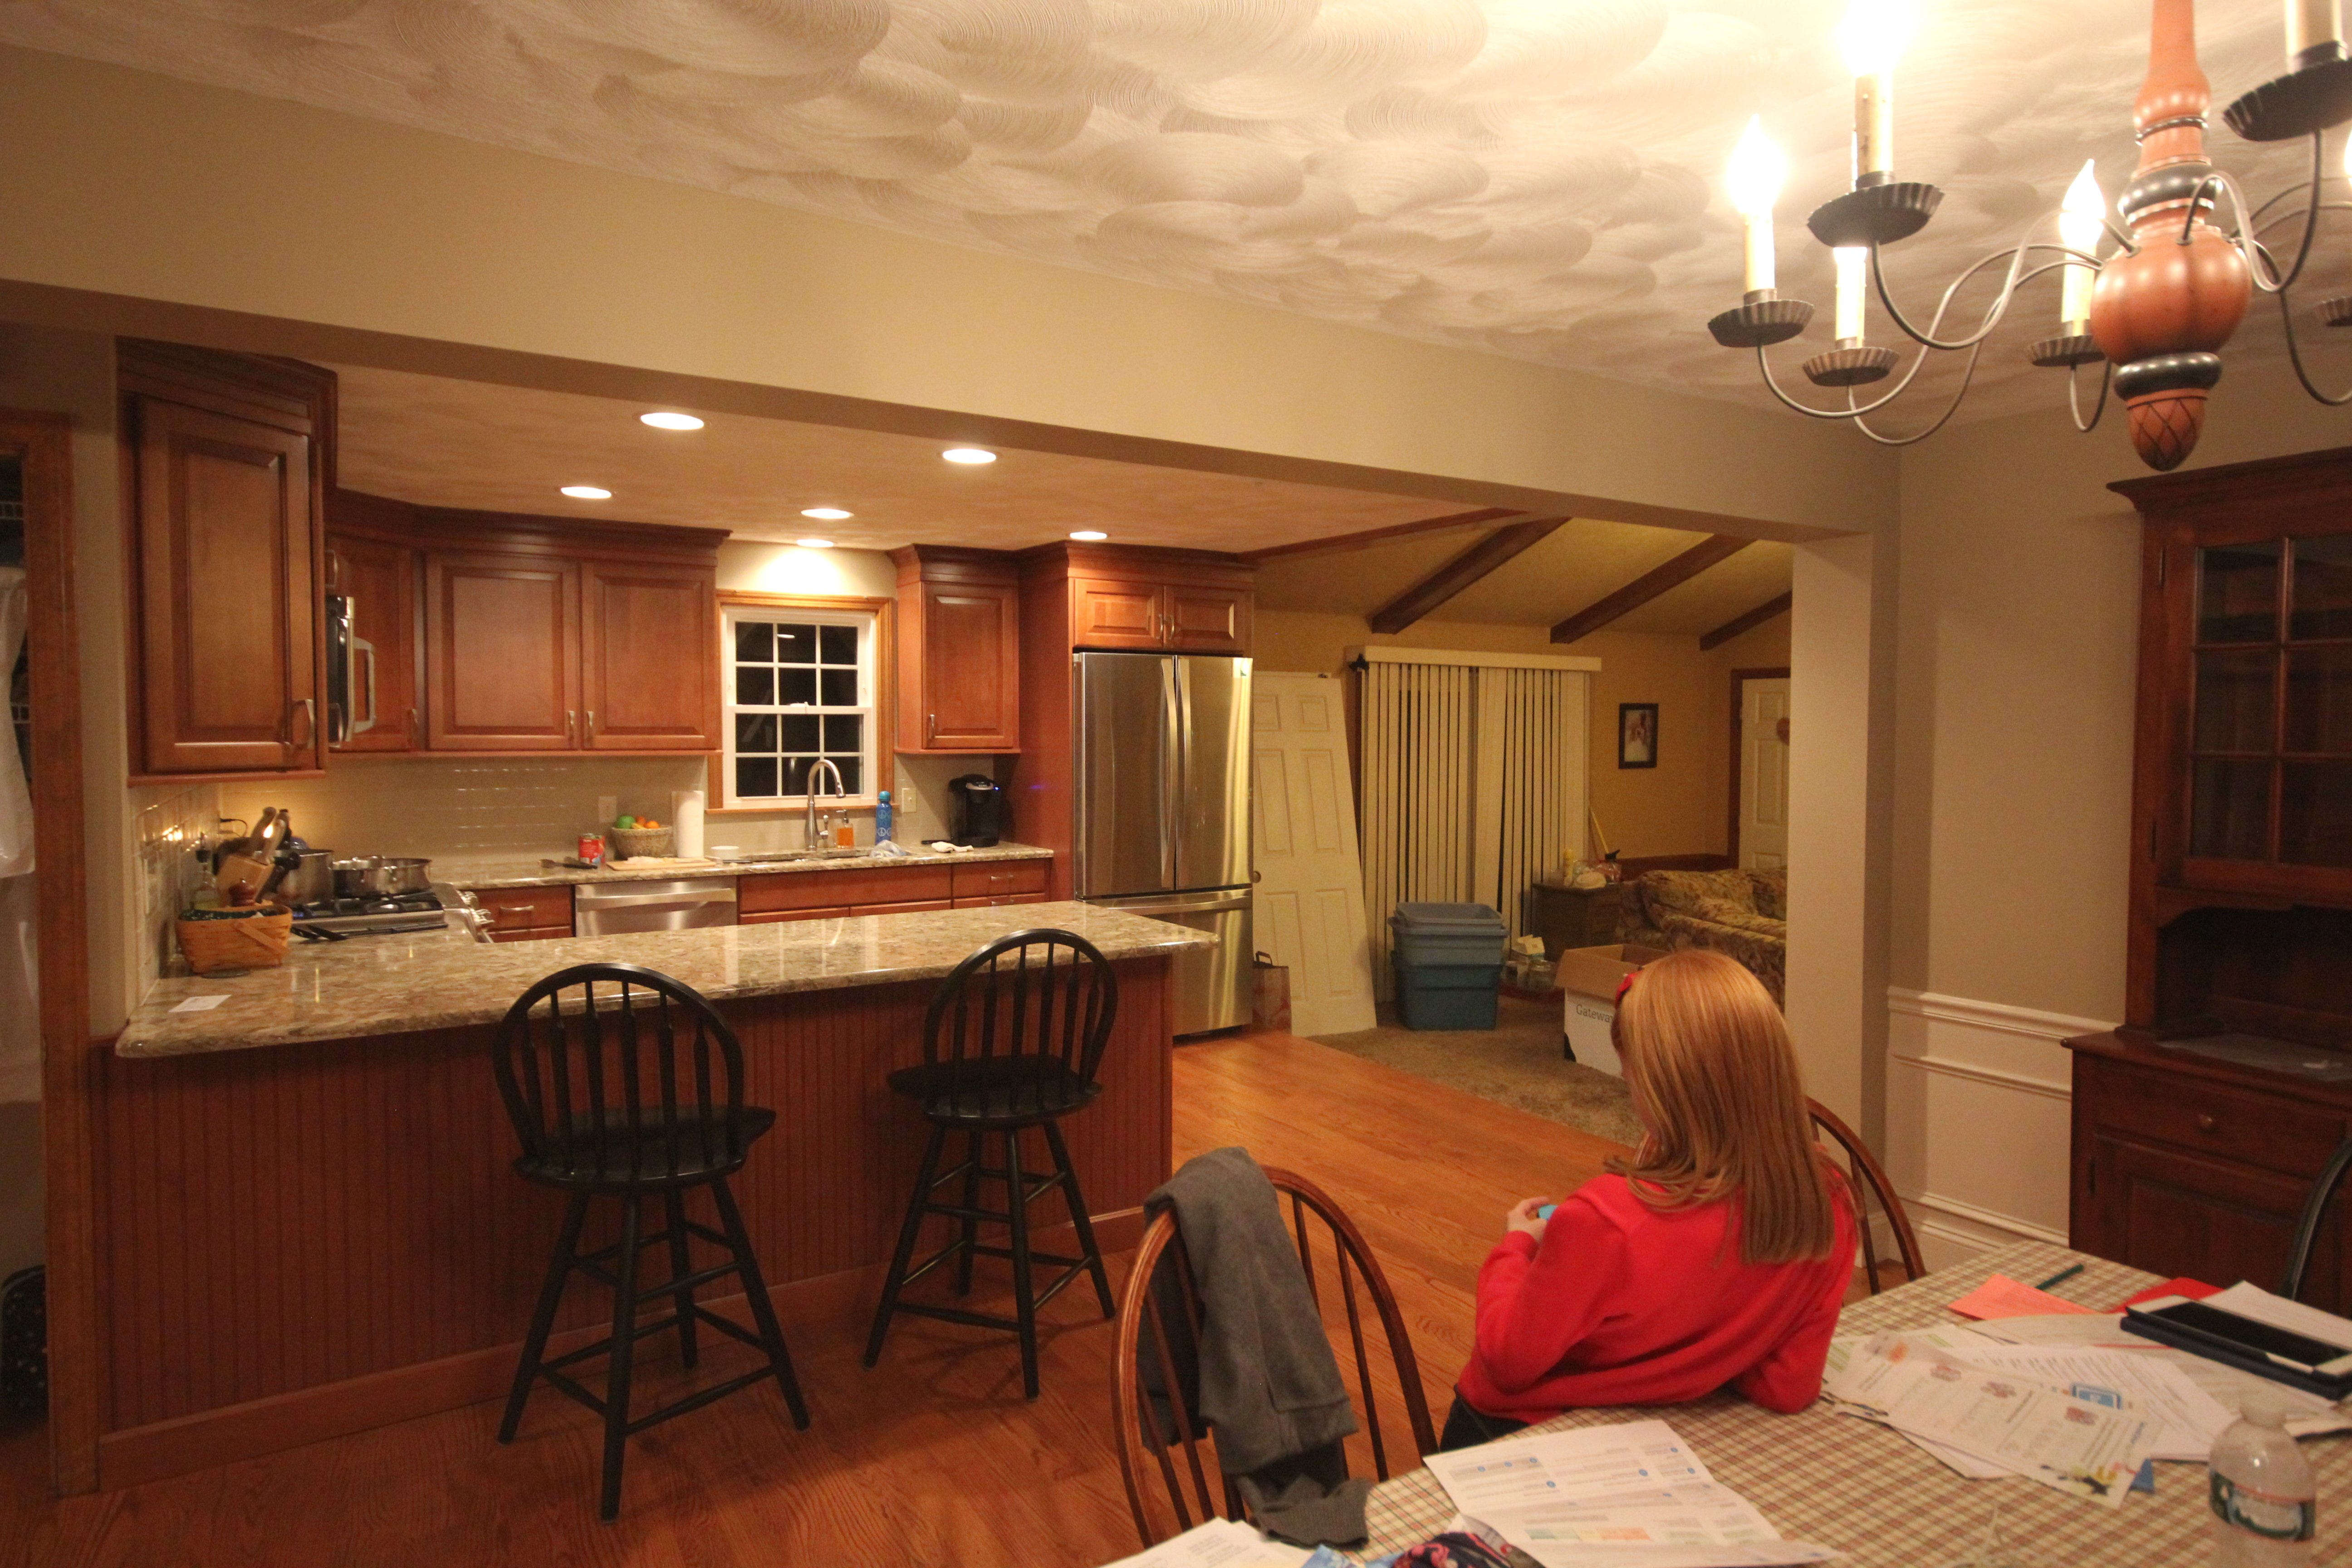 Rhode Island RI Kitchen & Bathroom Remodeling